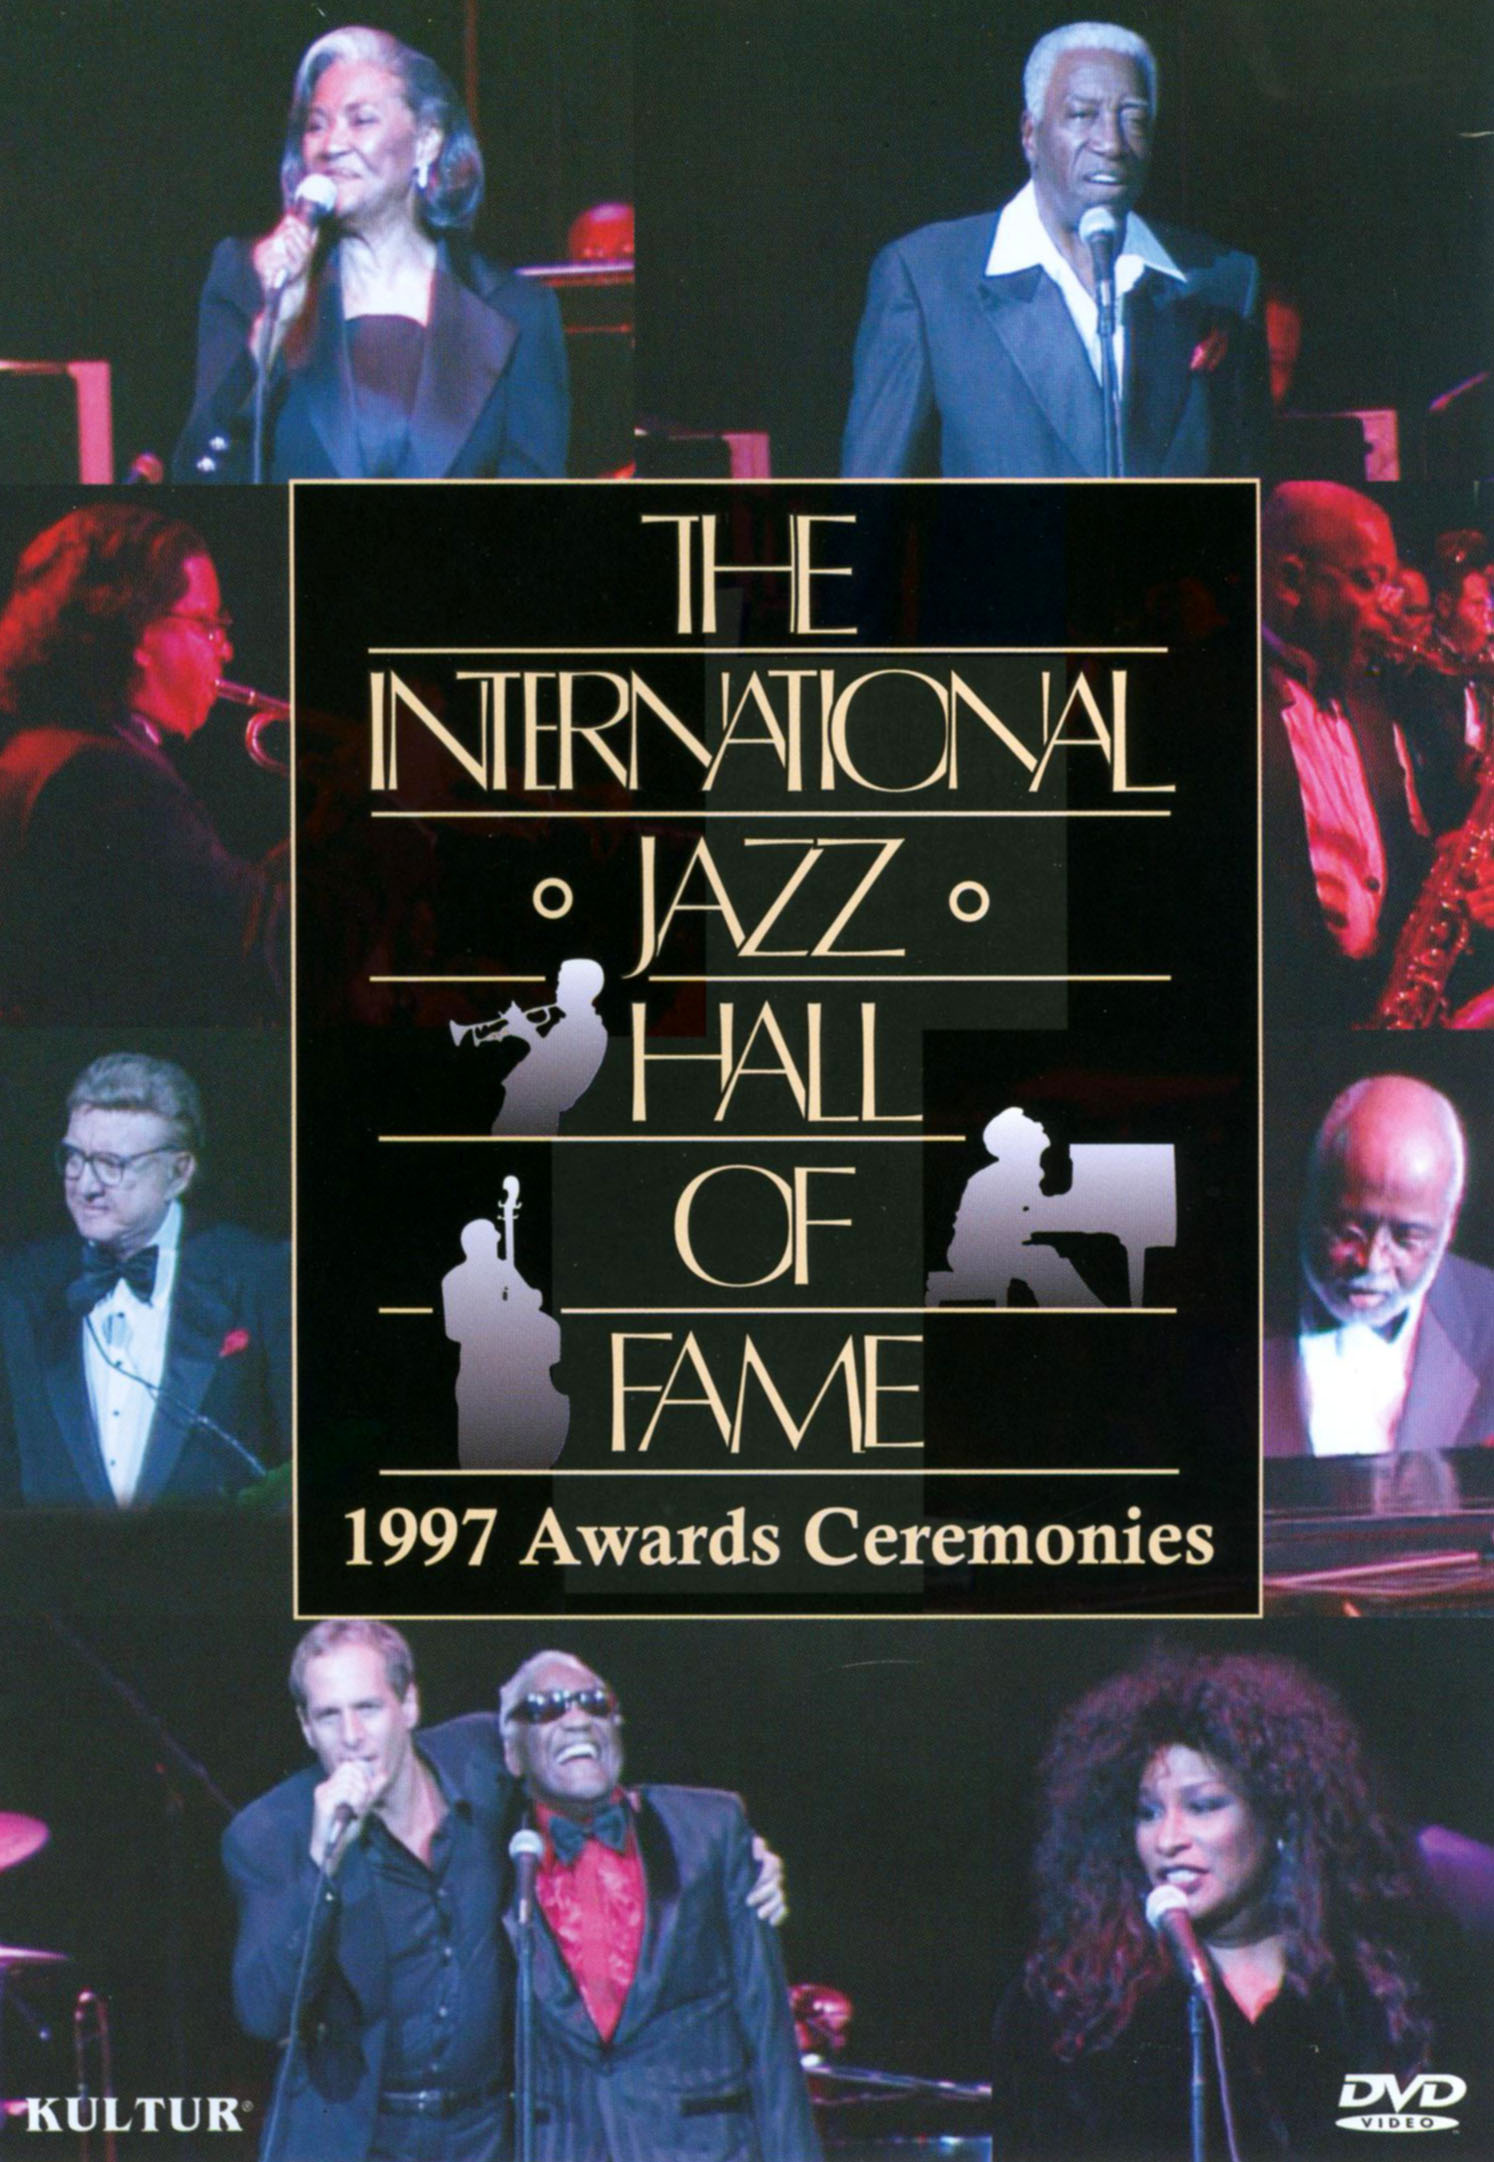 International Jazz Hall of Fame: 1997 Awards Ceremonies